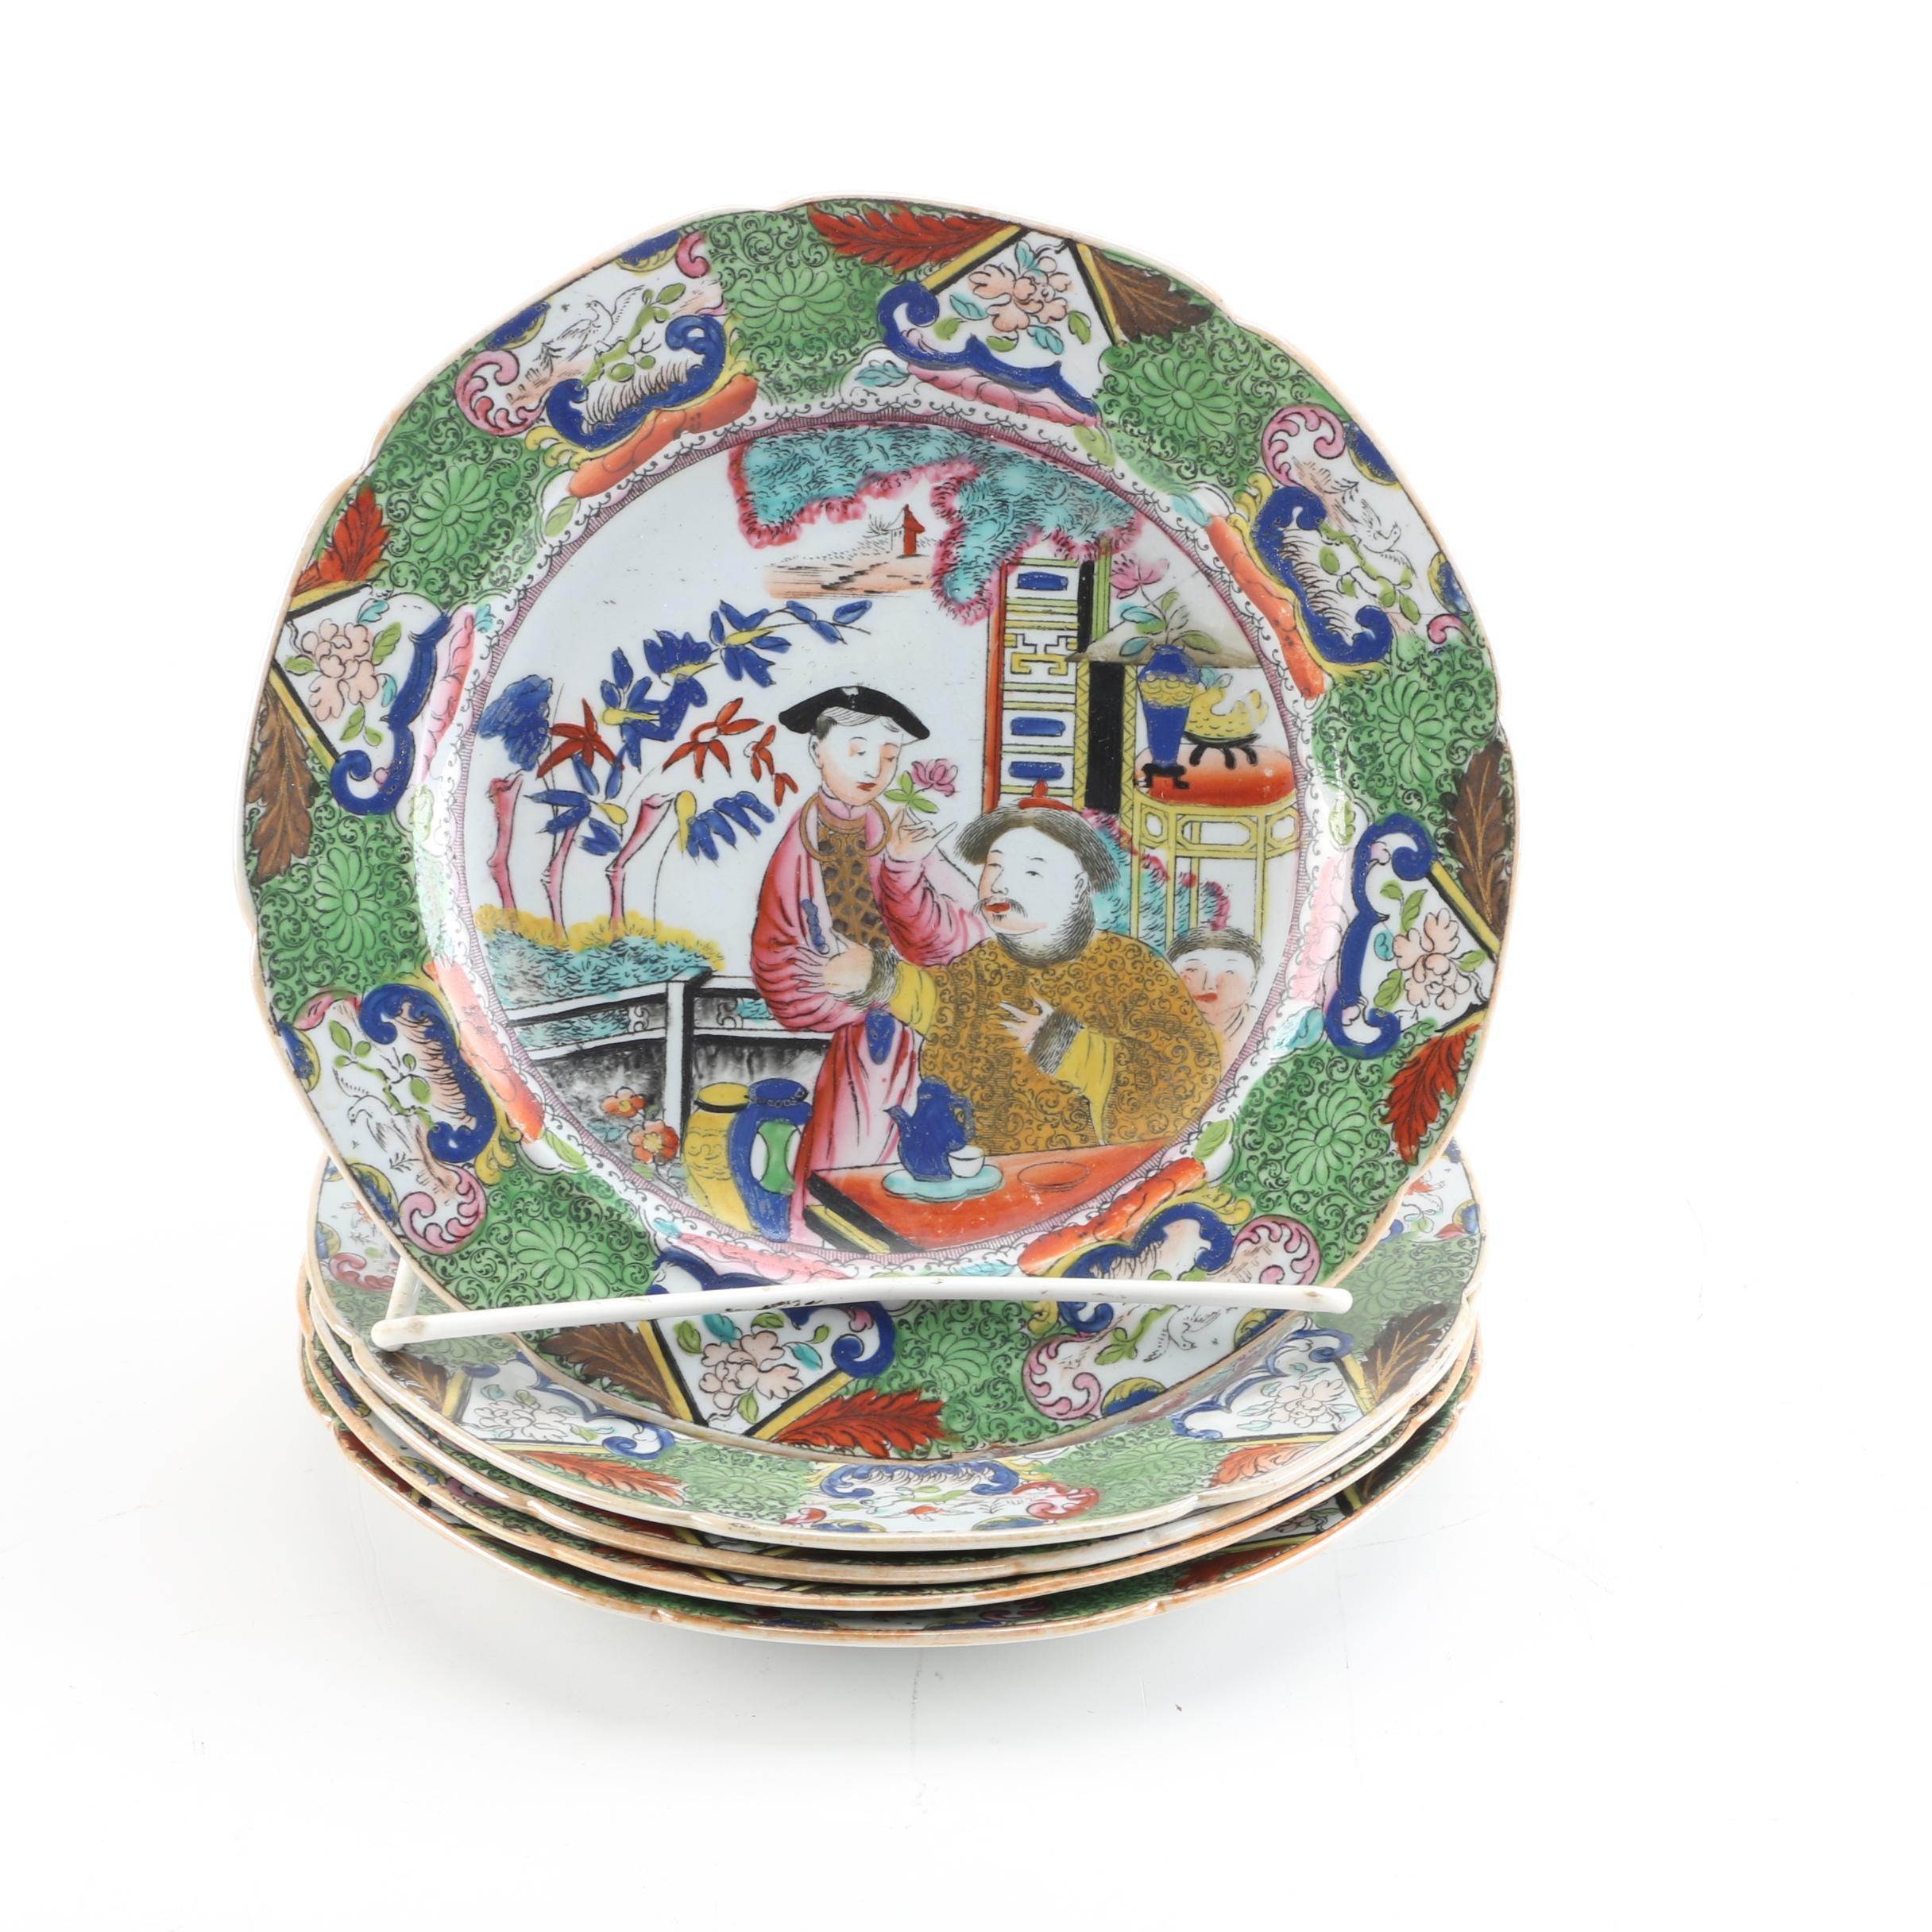 Antique Mason's Patent Ironstone China Plates ca. 1813-20